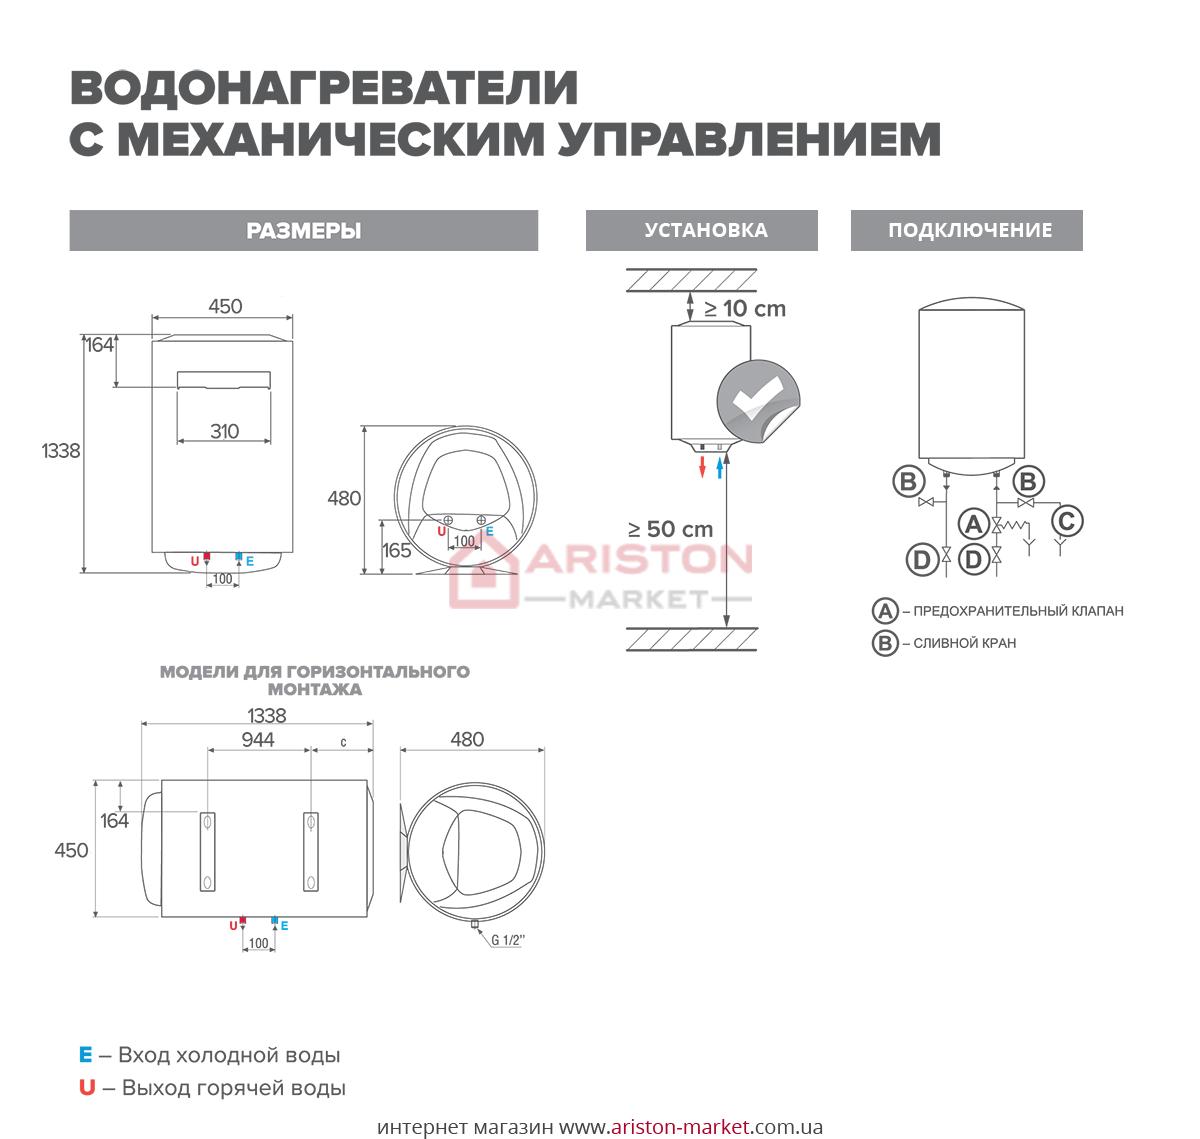 Ariston PRO R 150V 2K схема, габариты, чертеж